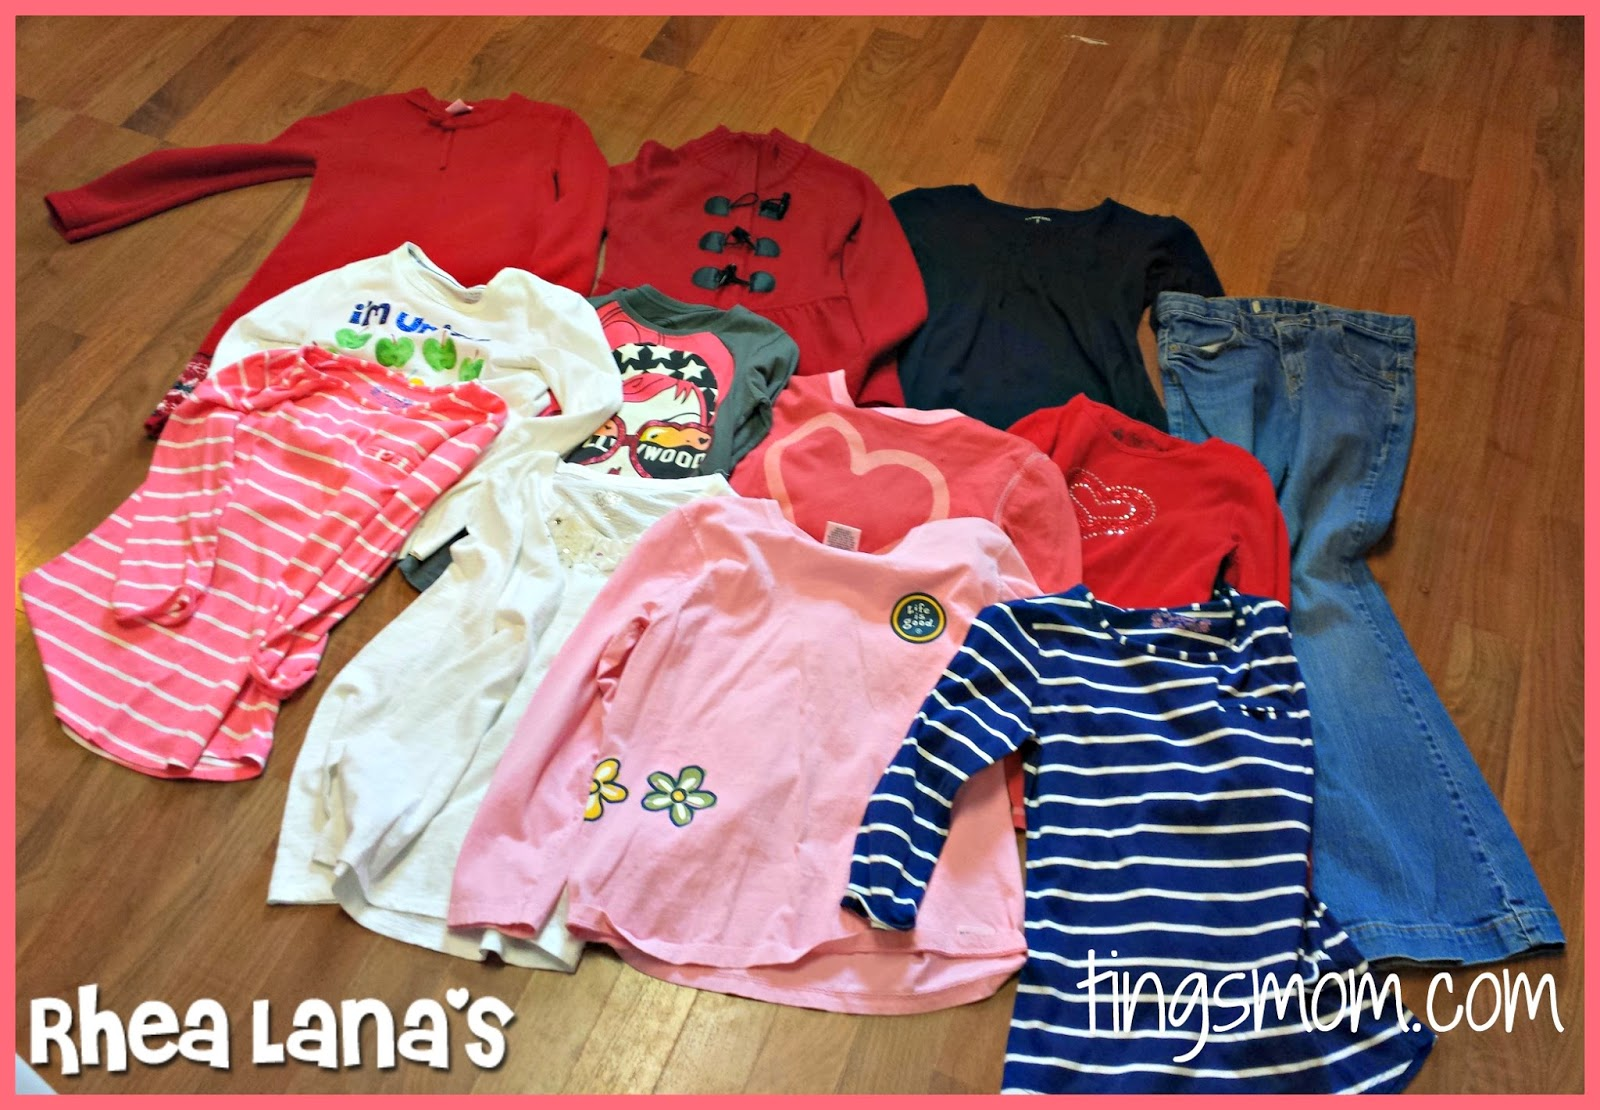 Rhea Lana Fall/Winter Haul | #rhealana #consignmentsale #kidsclothes #bargains